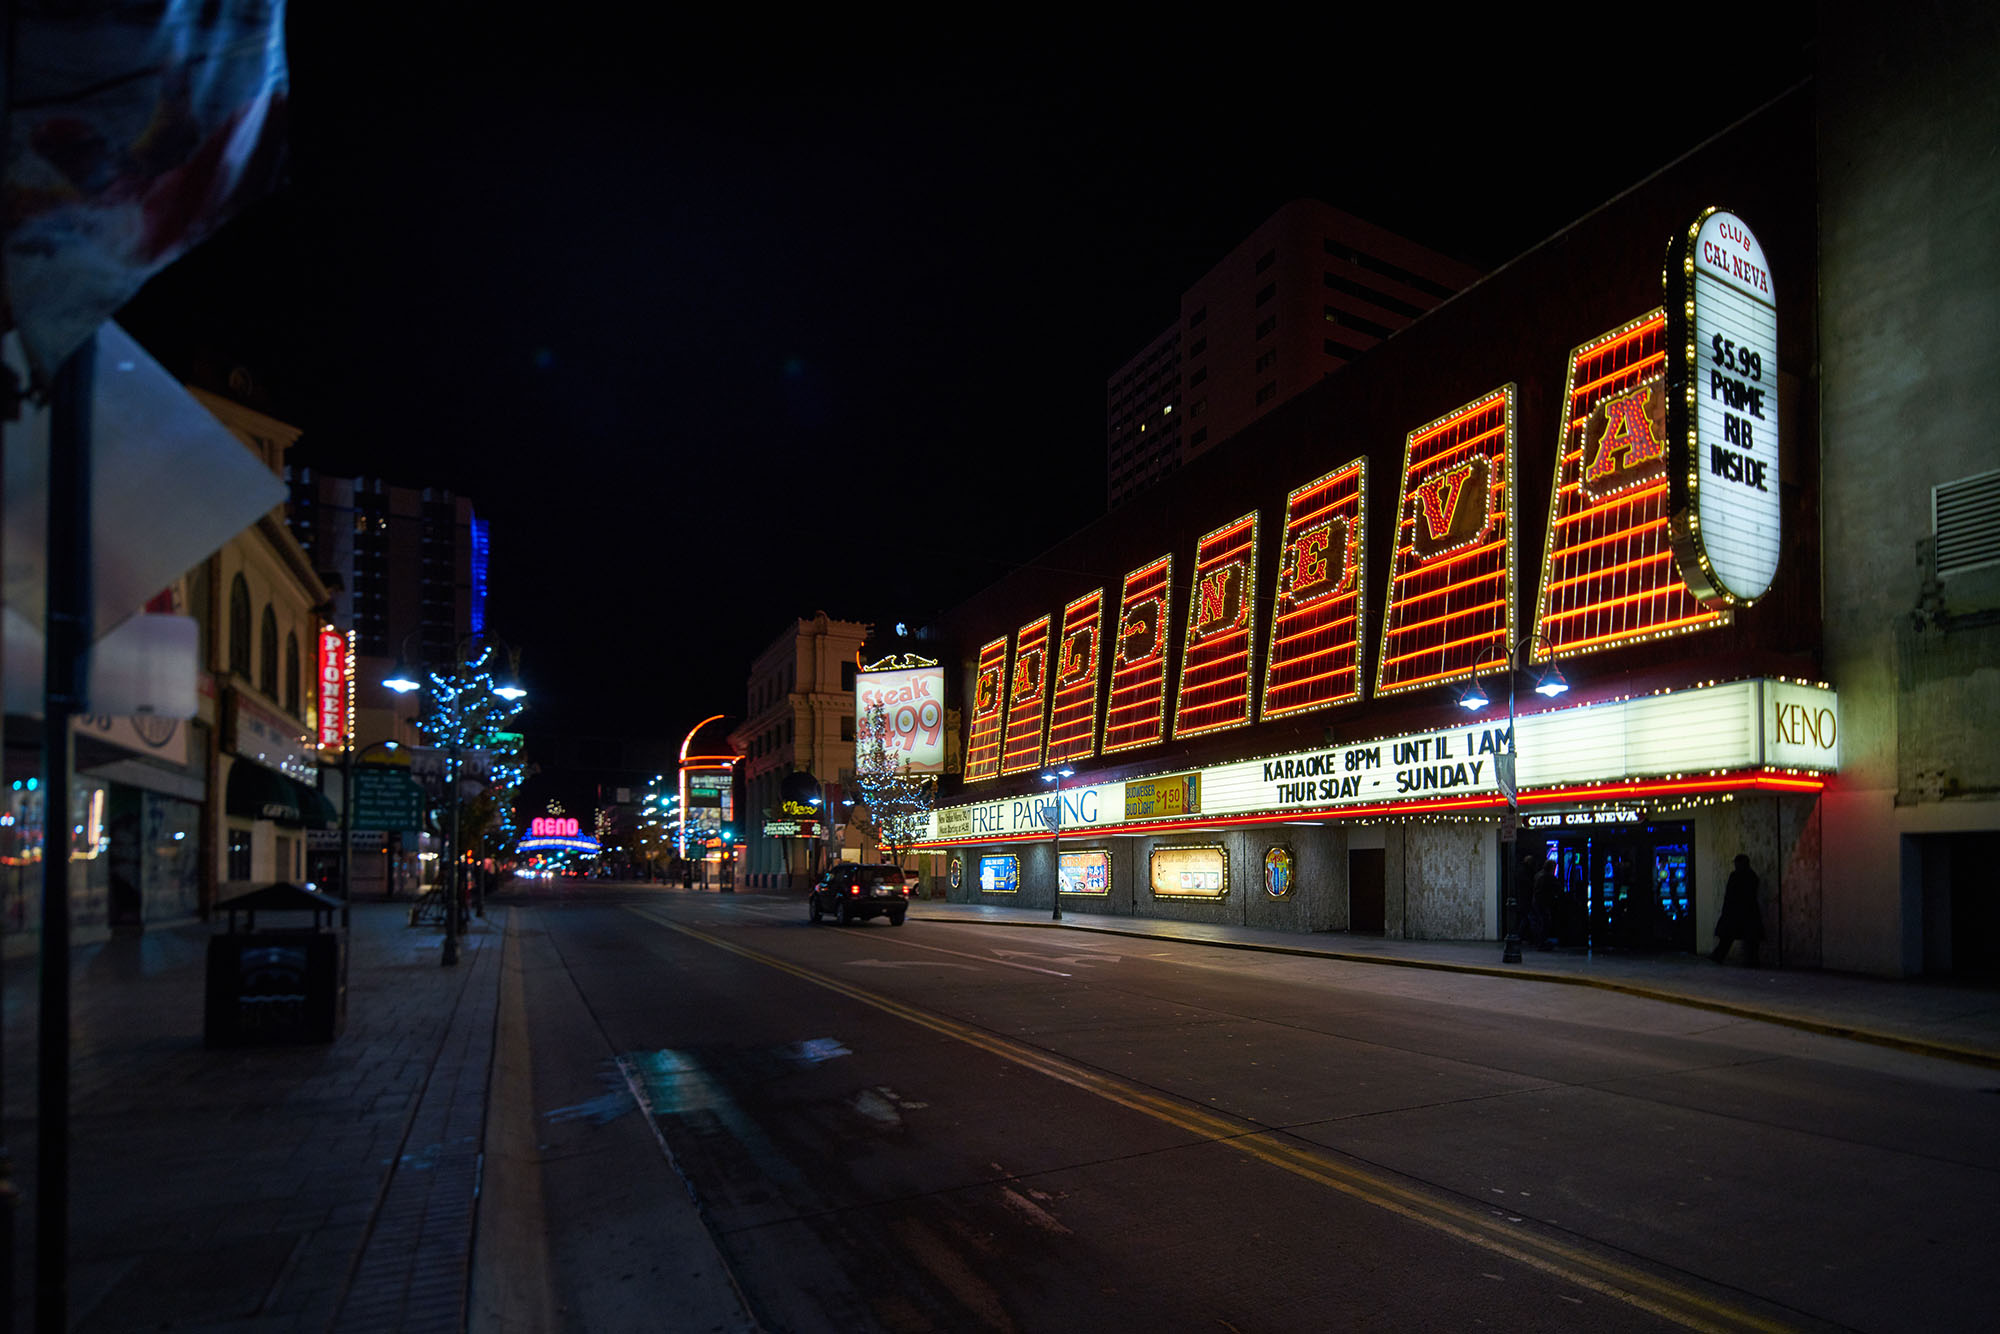 Reno, Nevada December 2015